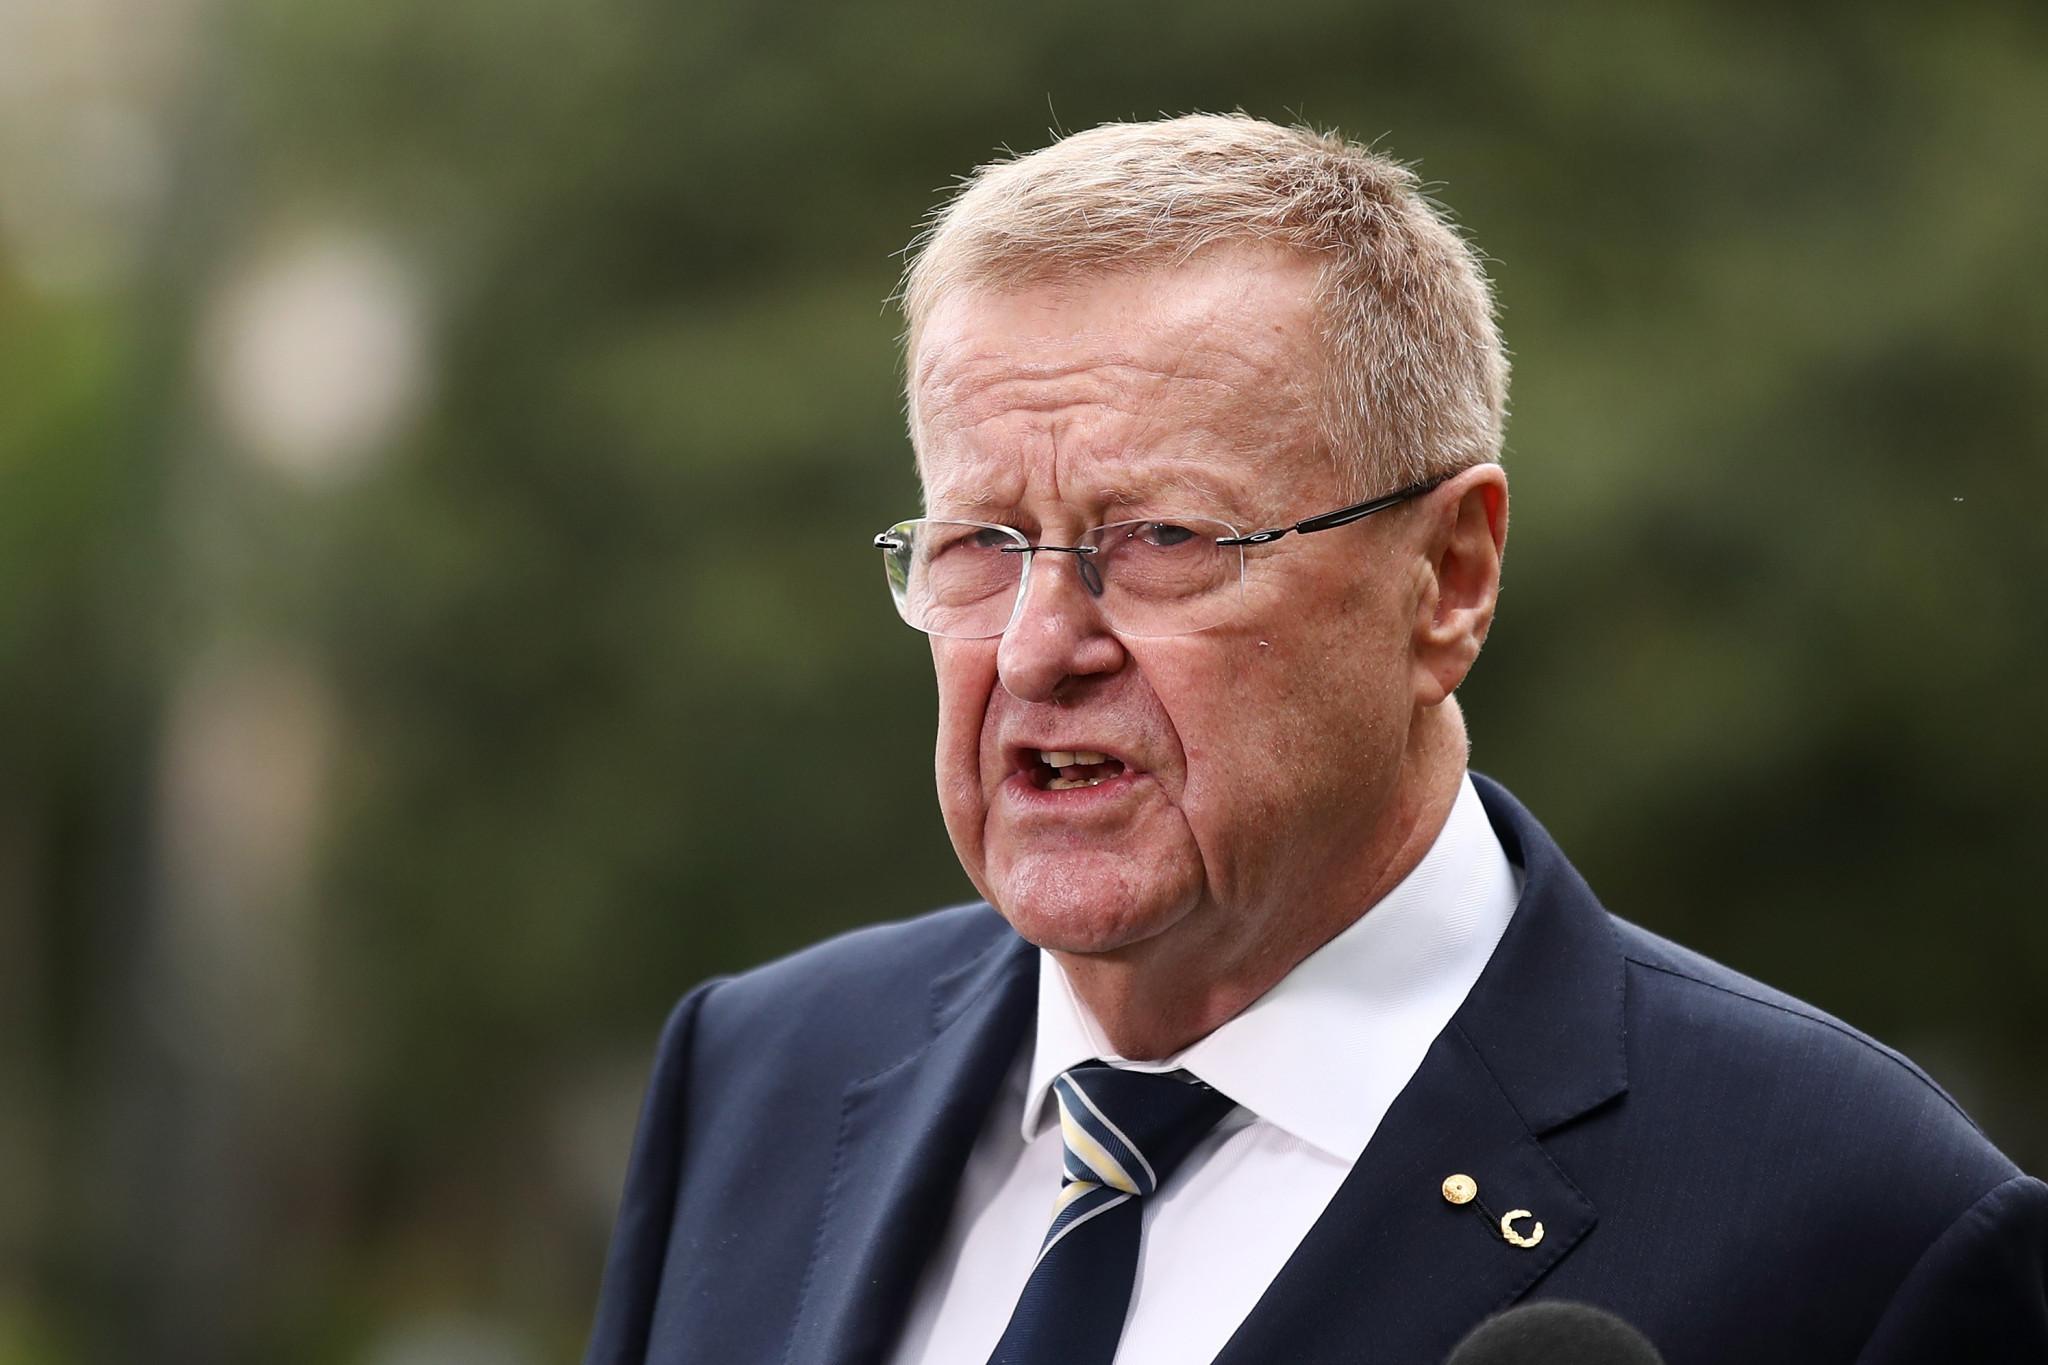 Coates confident Equestrian Australia will send team to Tokyo 2020 despite funding issues